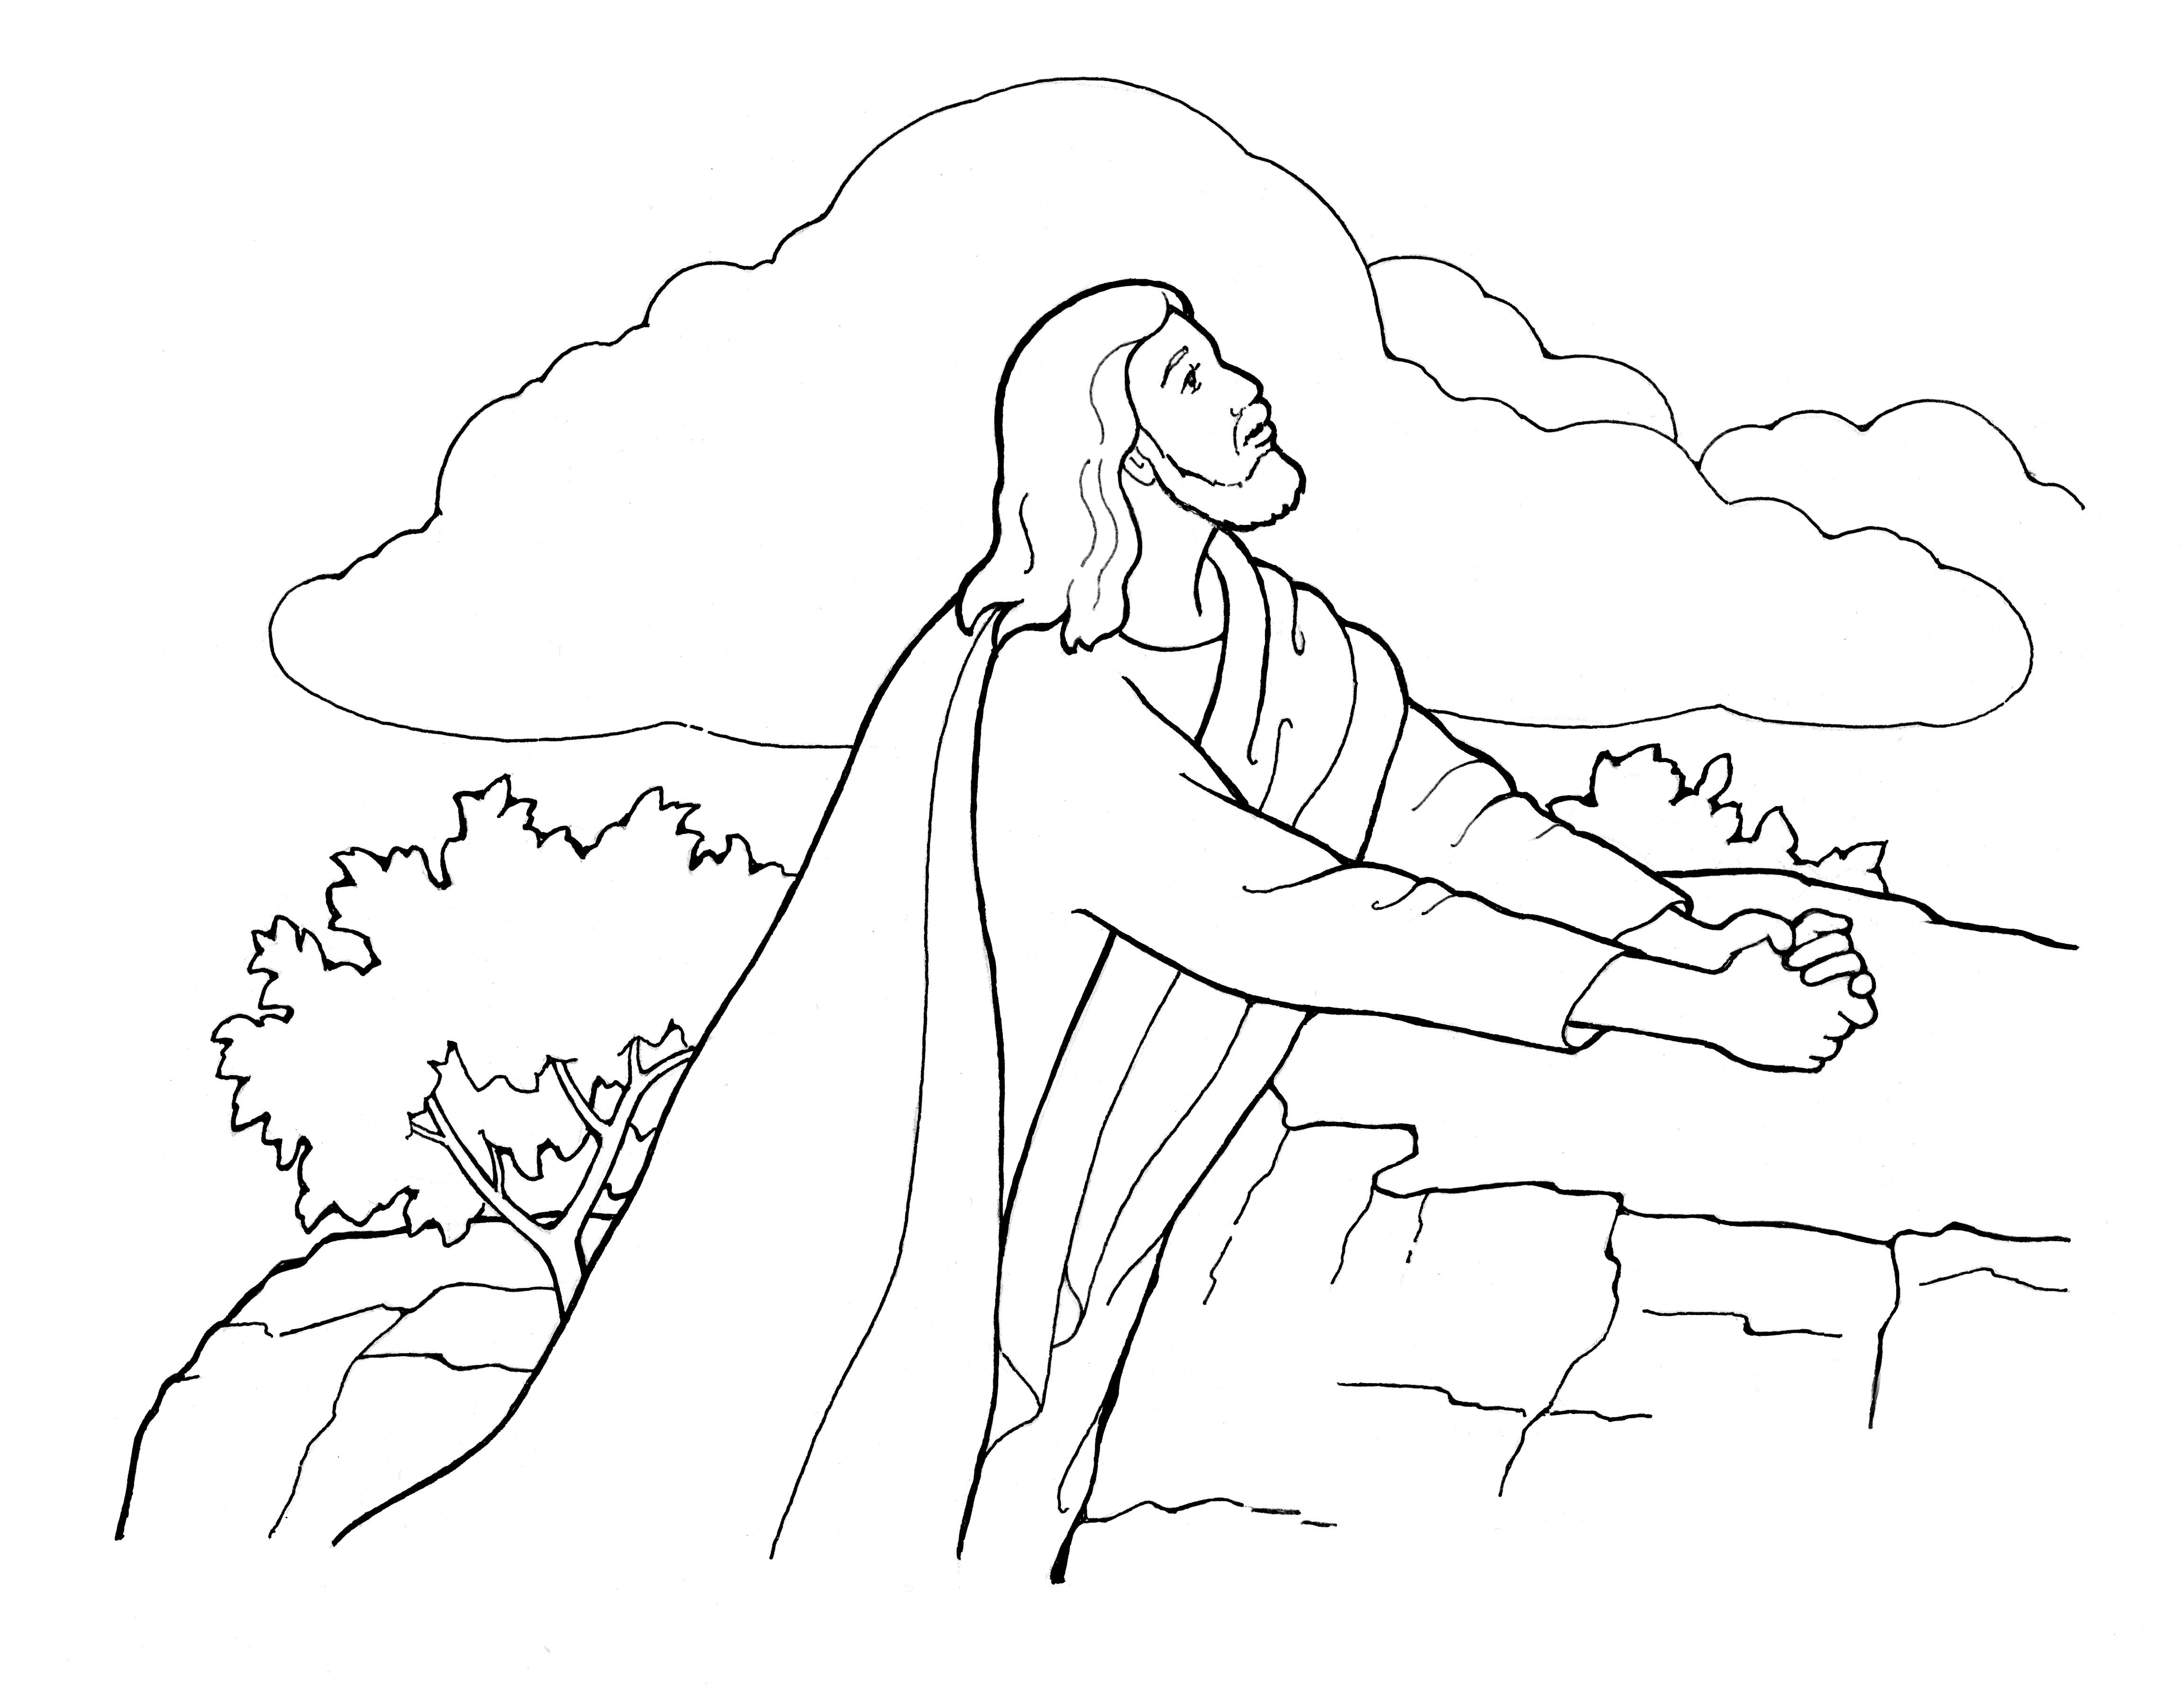 An illustration of Jesus Christ praying in the Garden of Gethsemane.